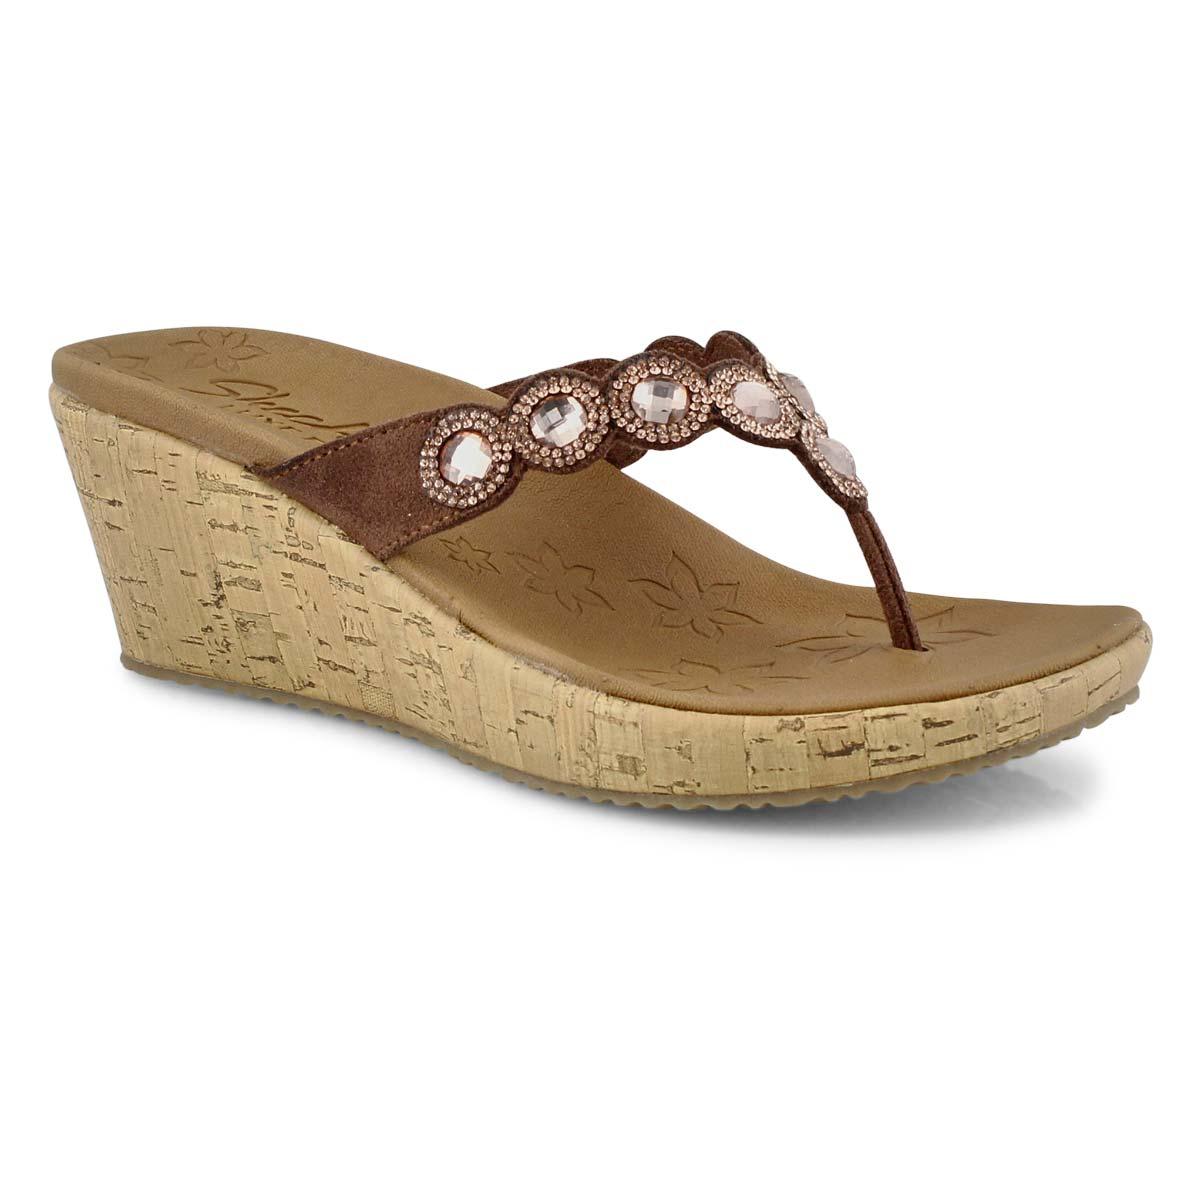 Sandale, BeverleeBizzyBabe, brun, femmes